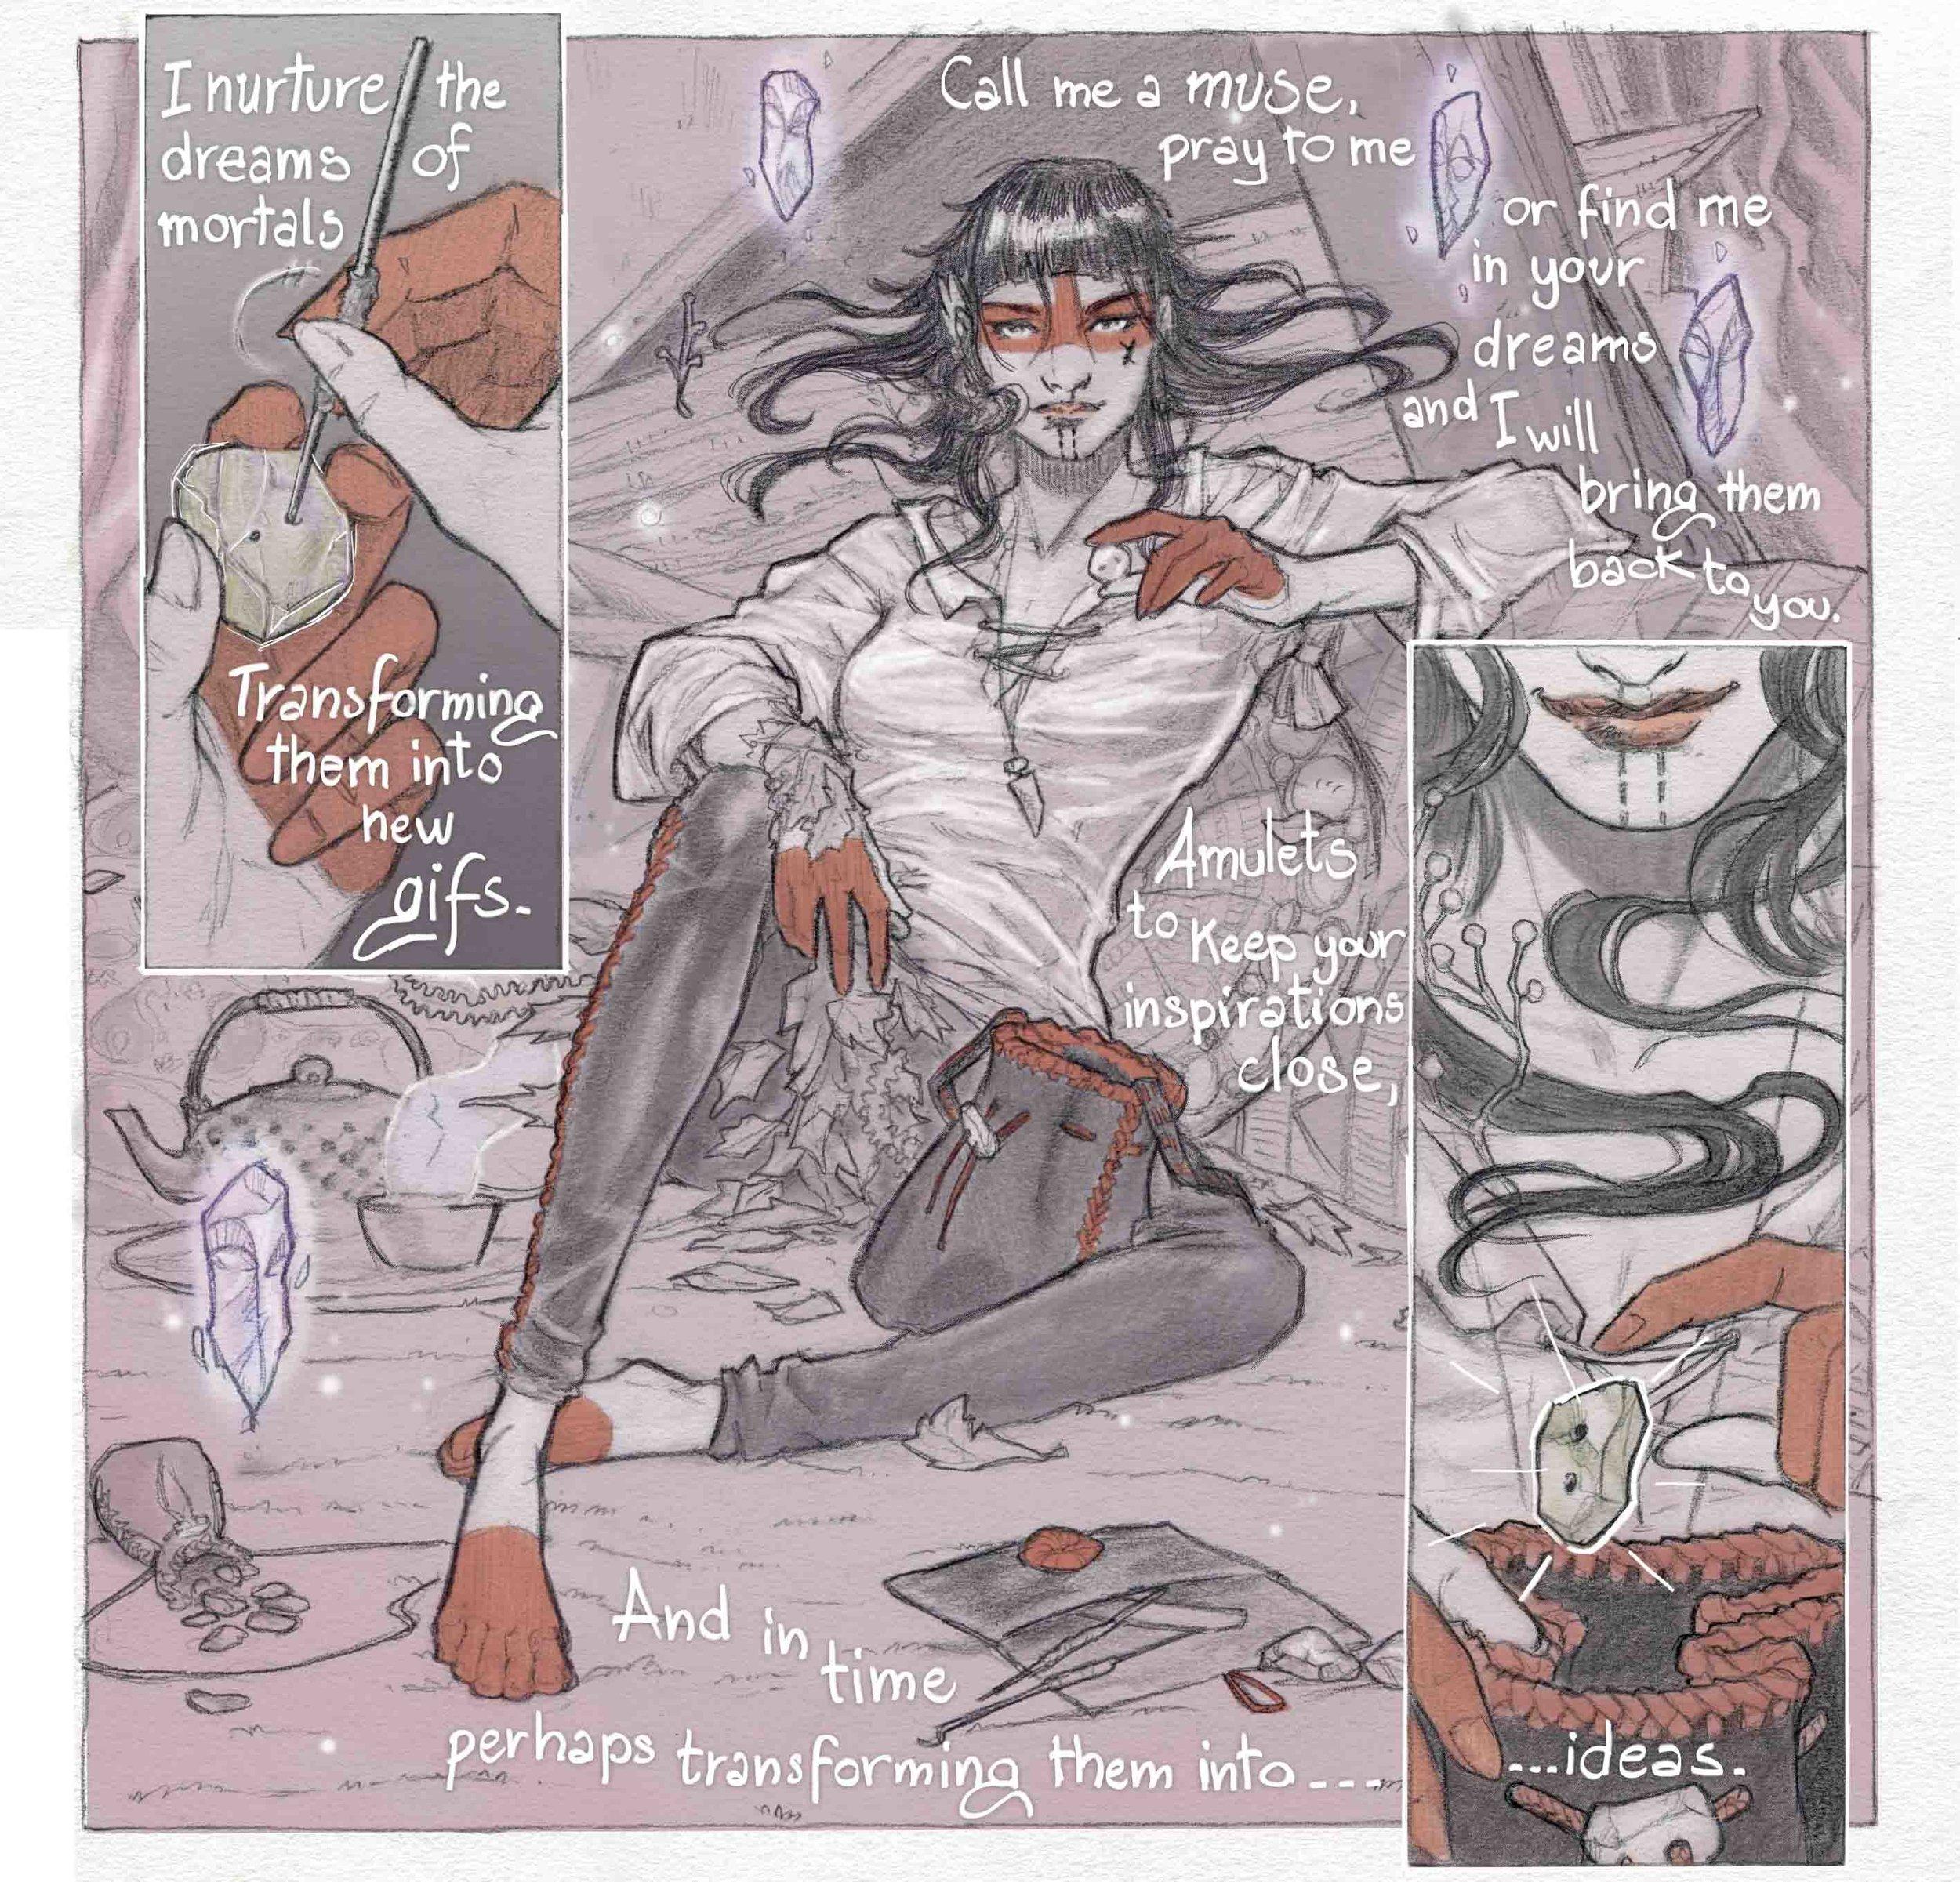 6_nirmala_silvia_califano_iacobella_comic.jpg